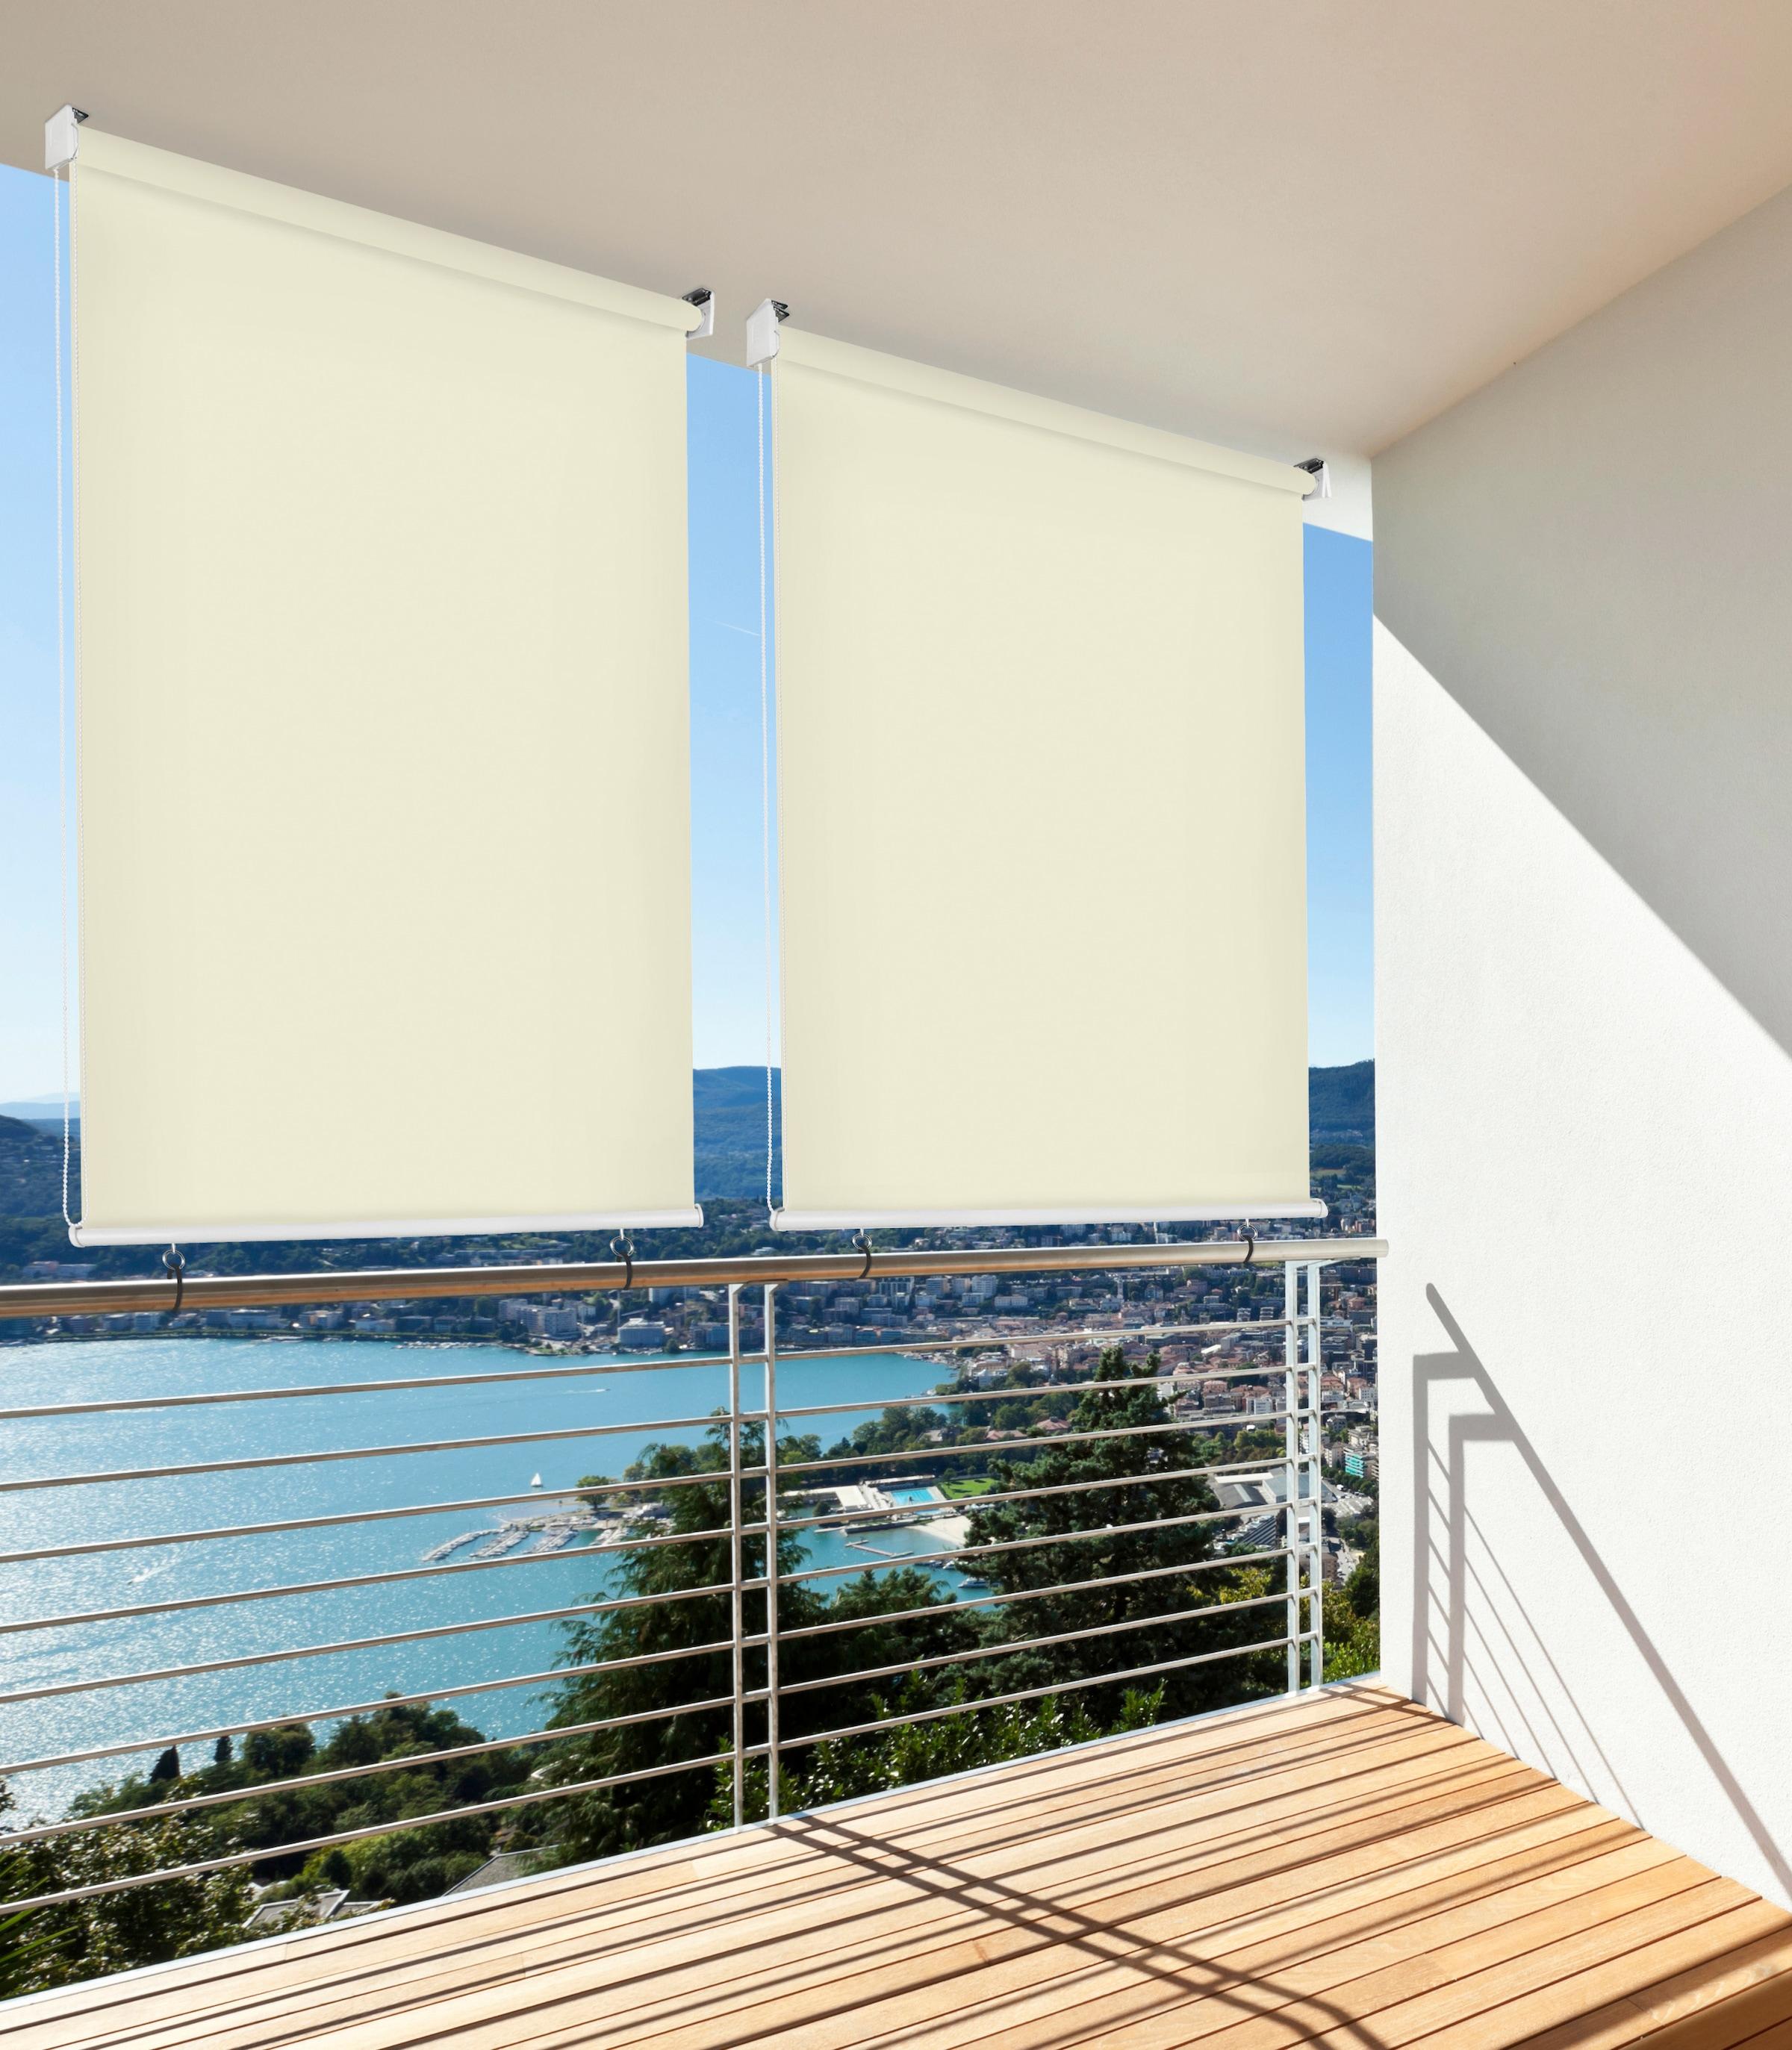 Garten Estexo Balkon Sichtschutz Balkonbespannung